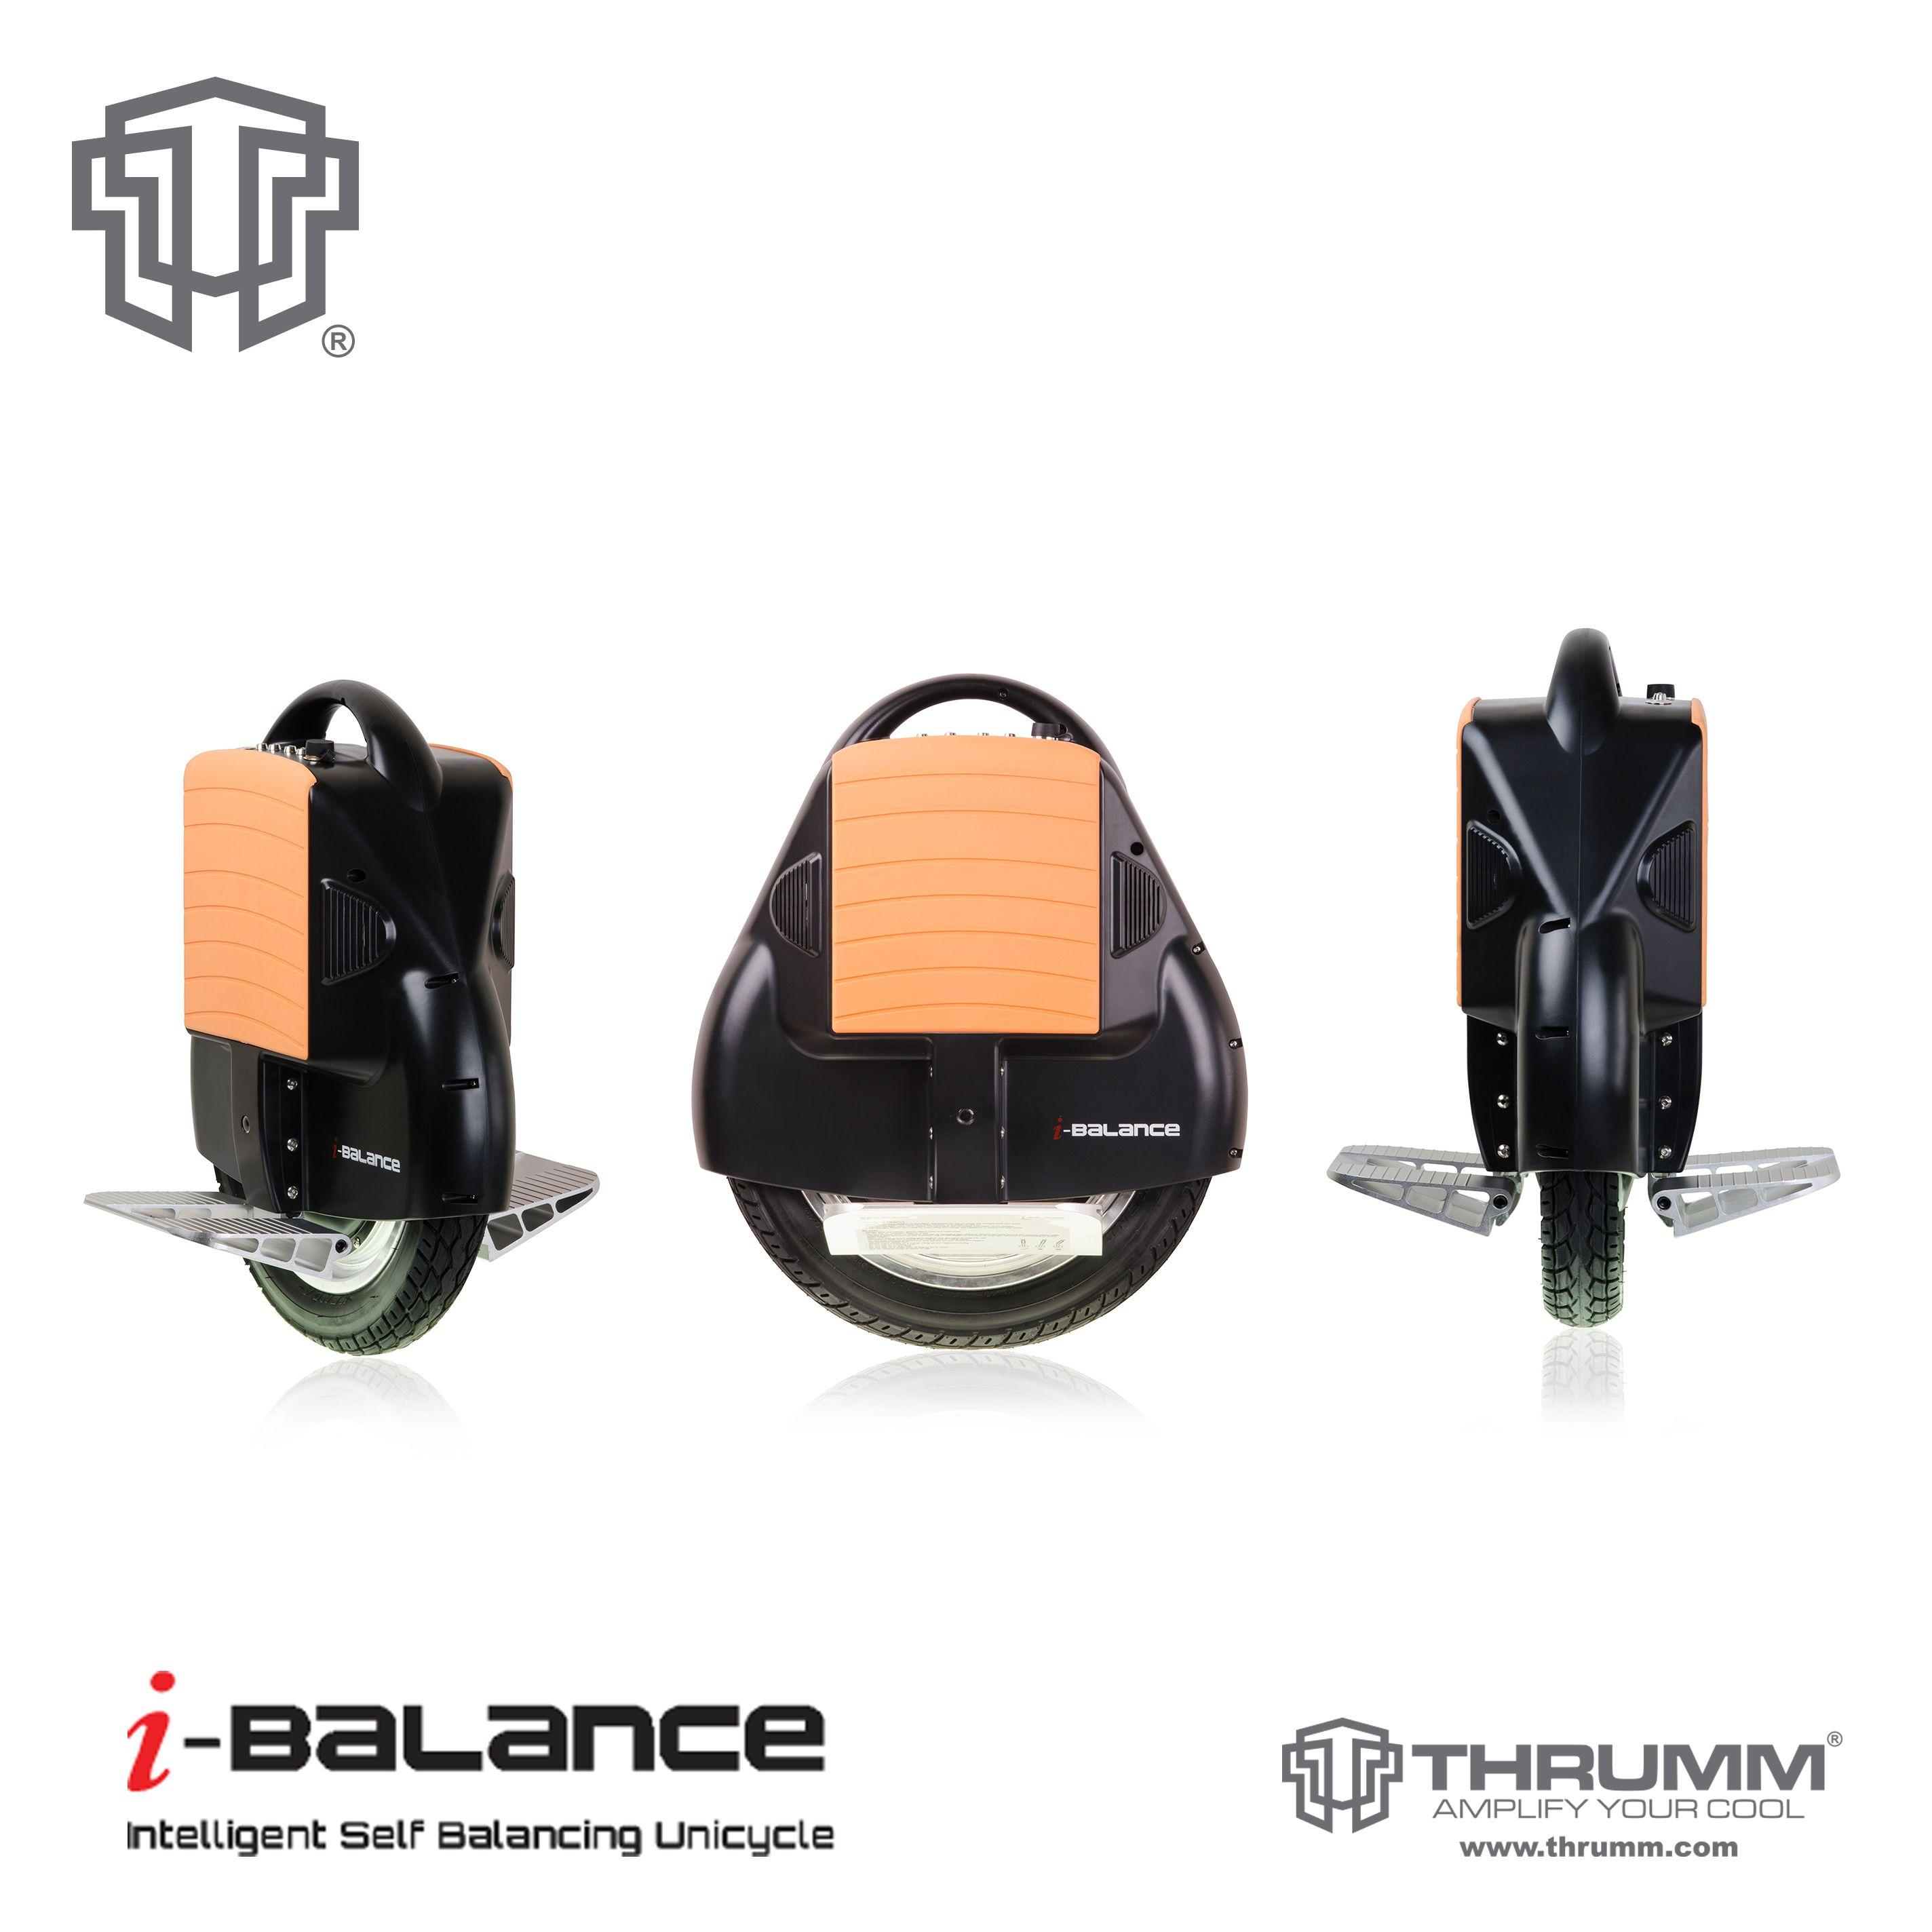 #THRUMM #i-BalanceOrange